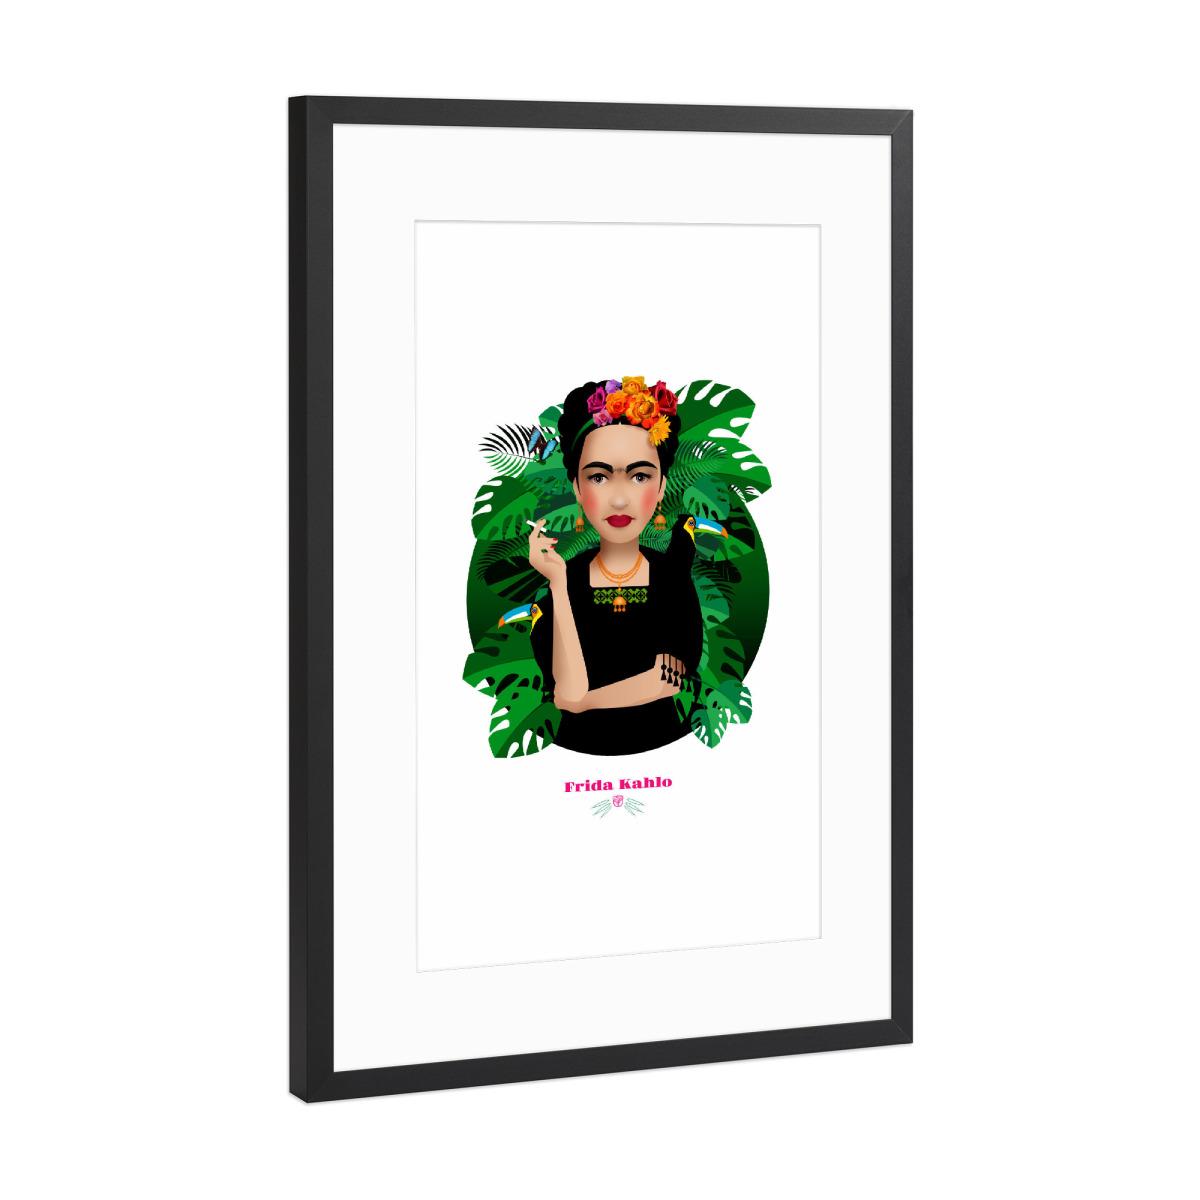 Purchase the Frida Kahlo as a Frame at artboxONE